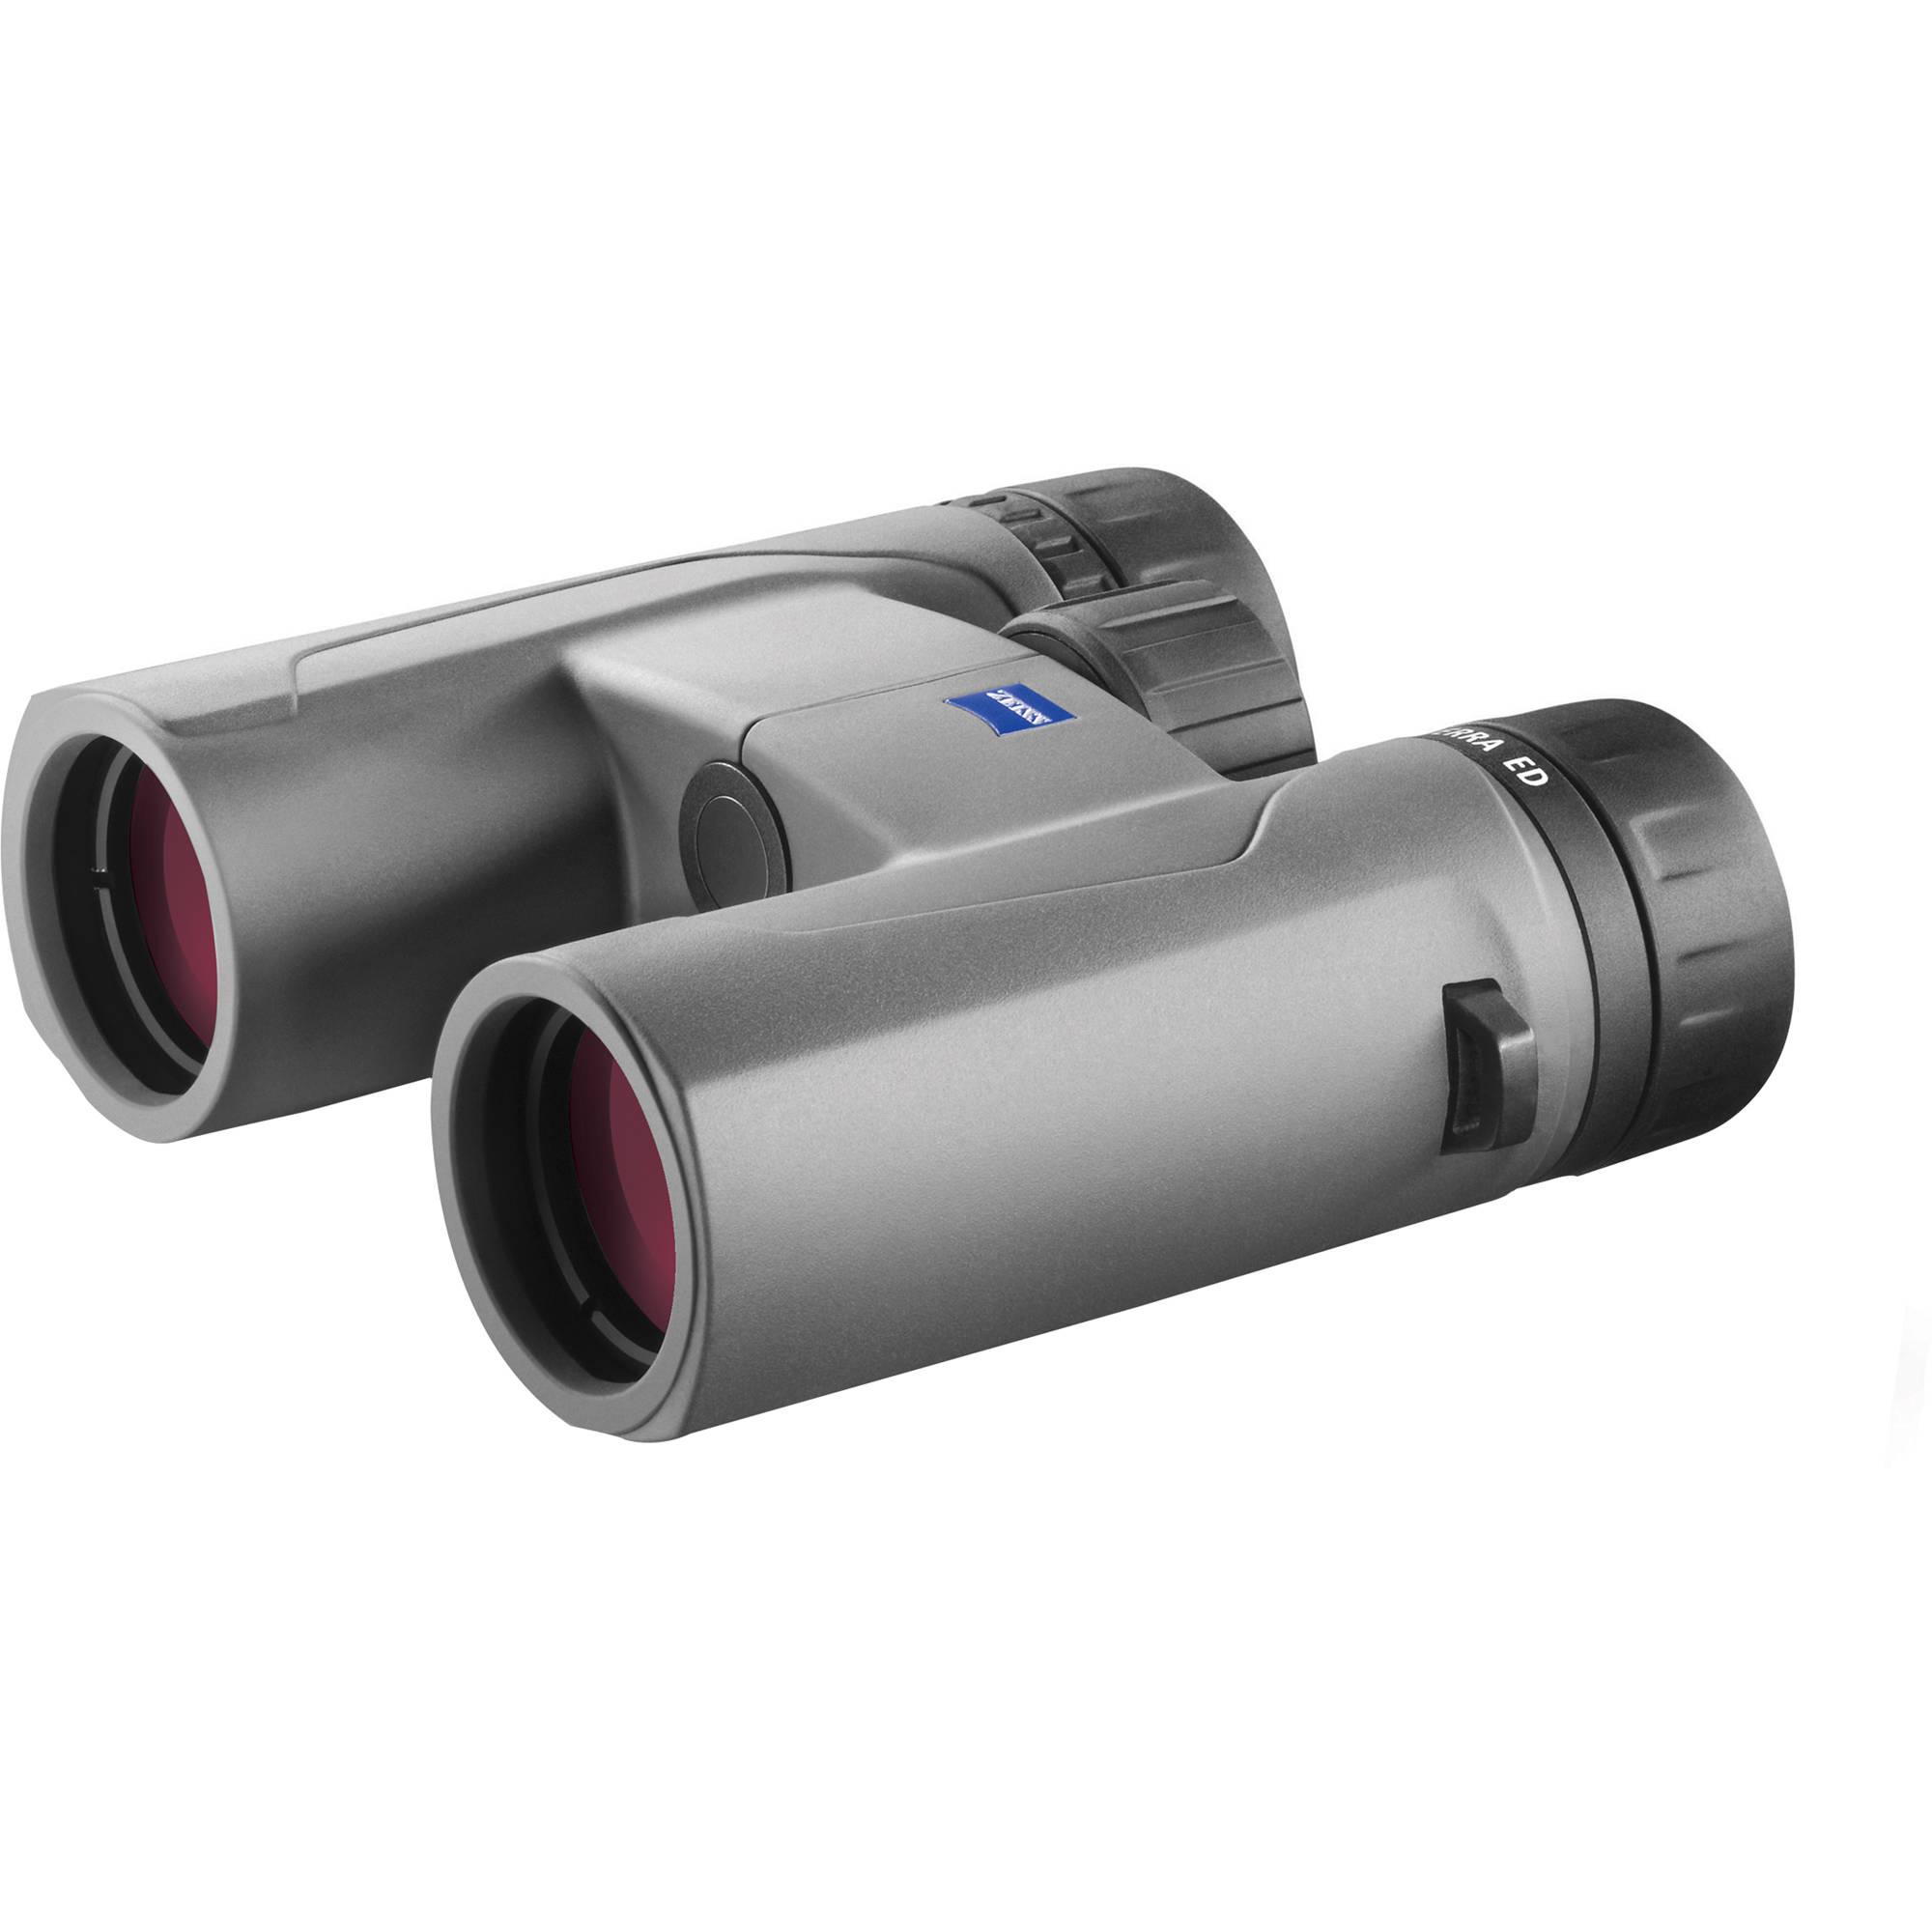 Zeiss 8x32 Terra Ed Binocular 523205 9906 000 B Amp H Photo Video